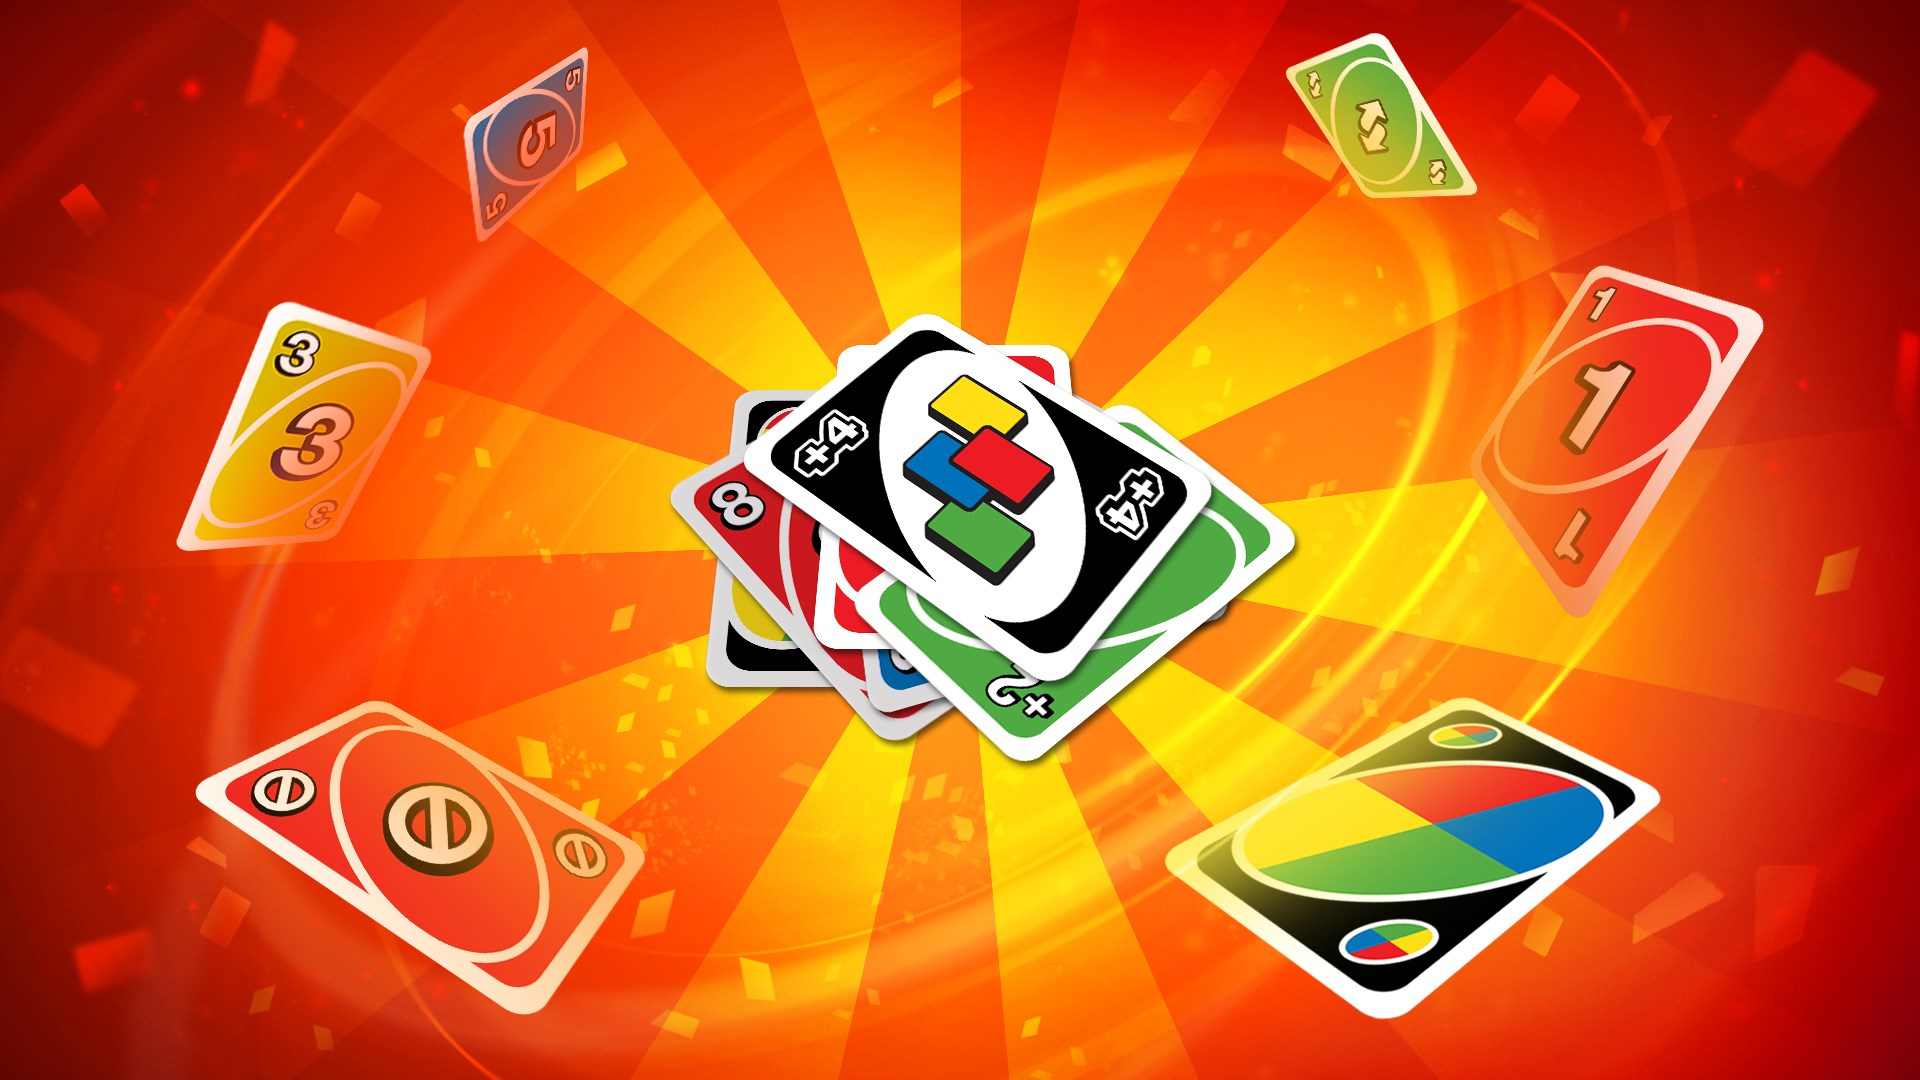 Buy UNO® - Microsoft Store